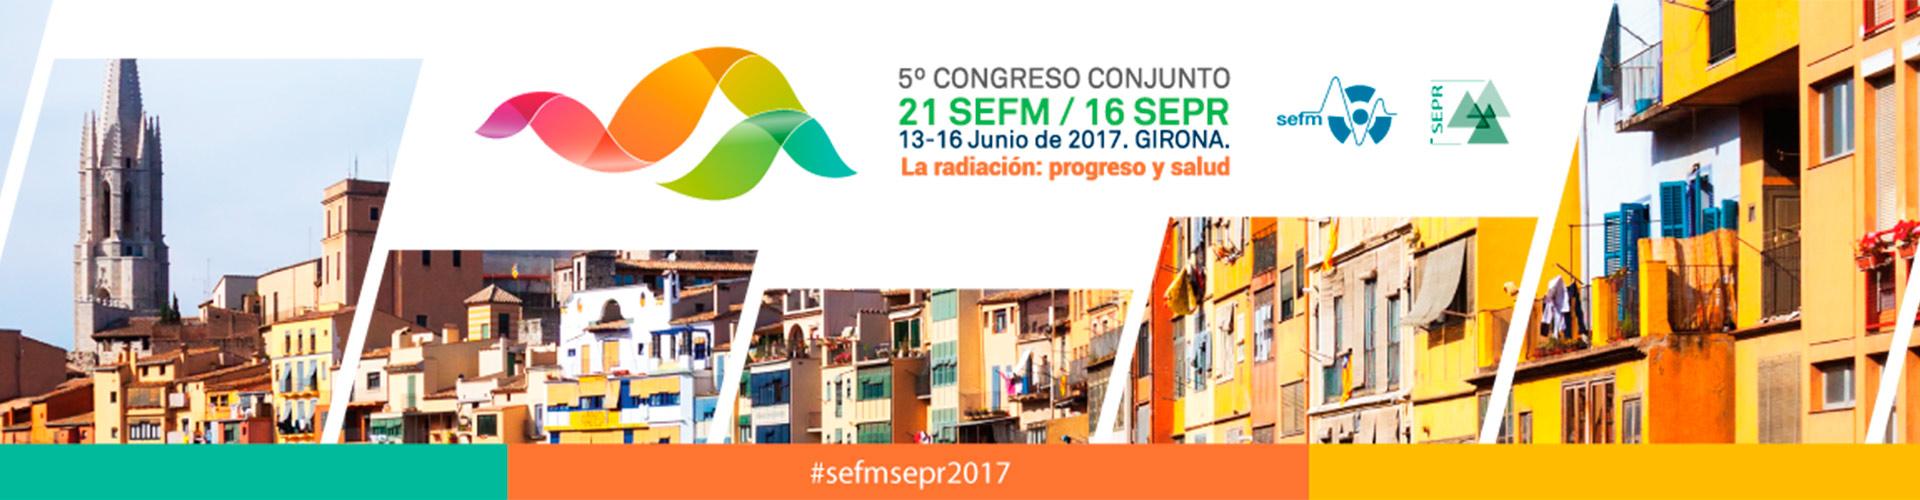 5 congreso conjunto SEFM SEPR